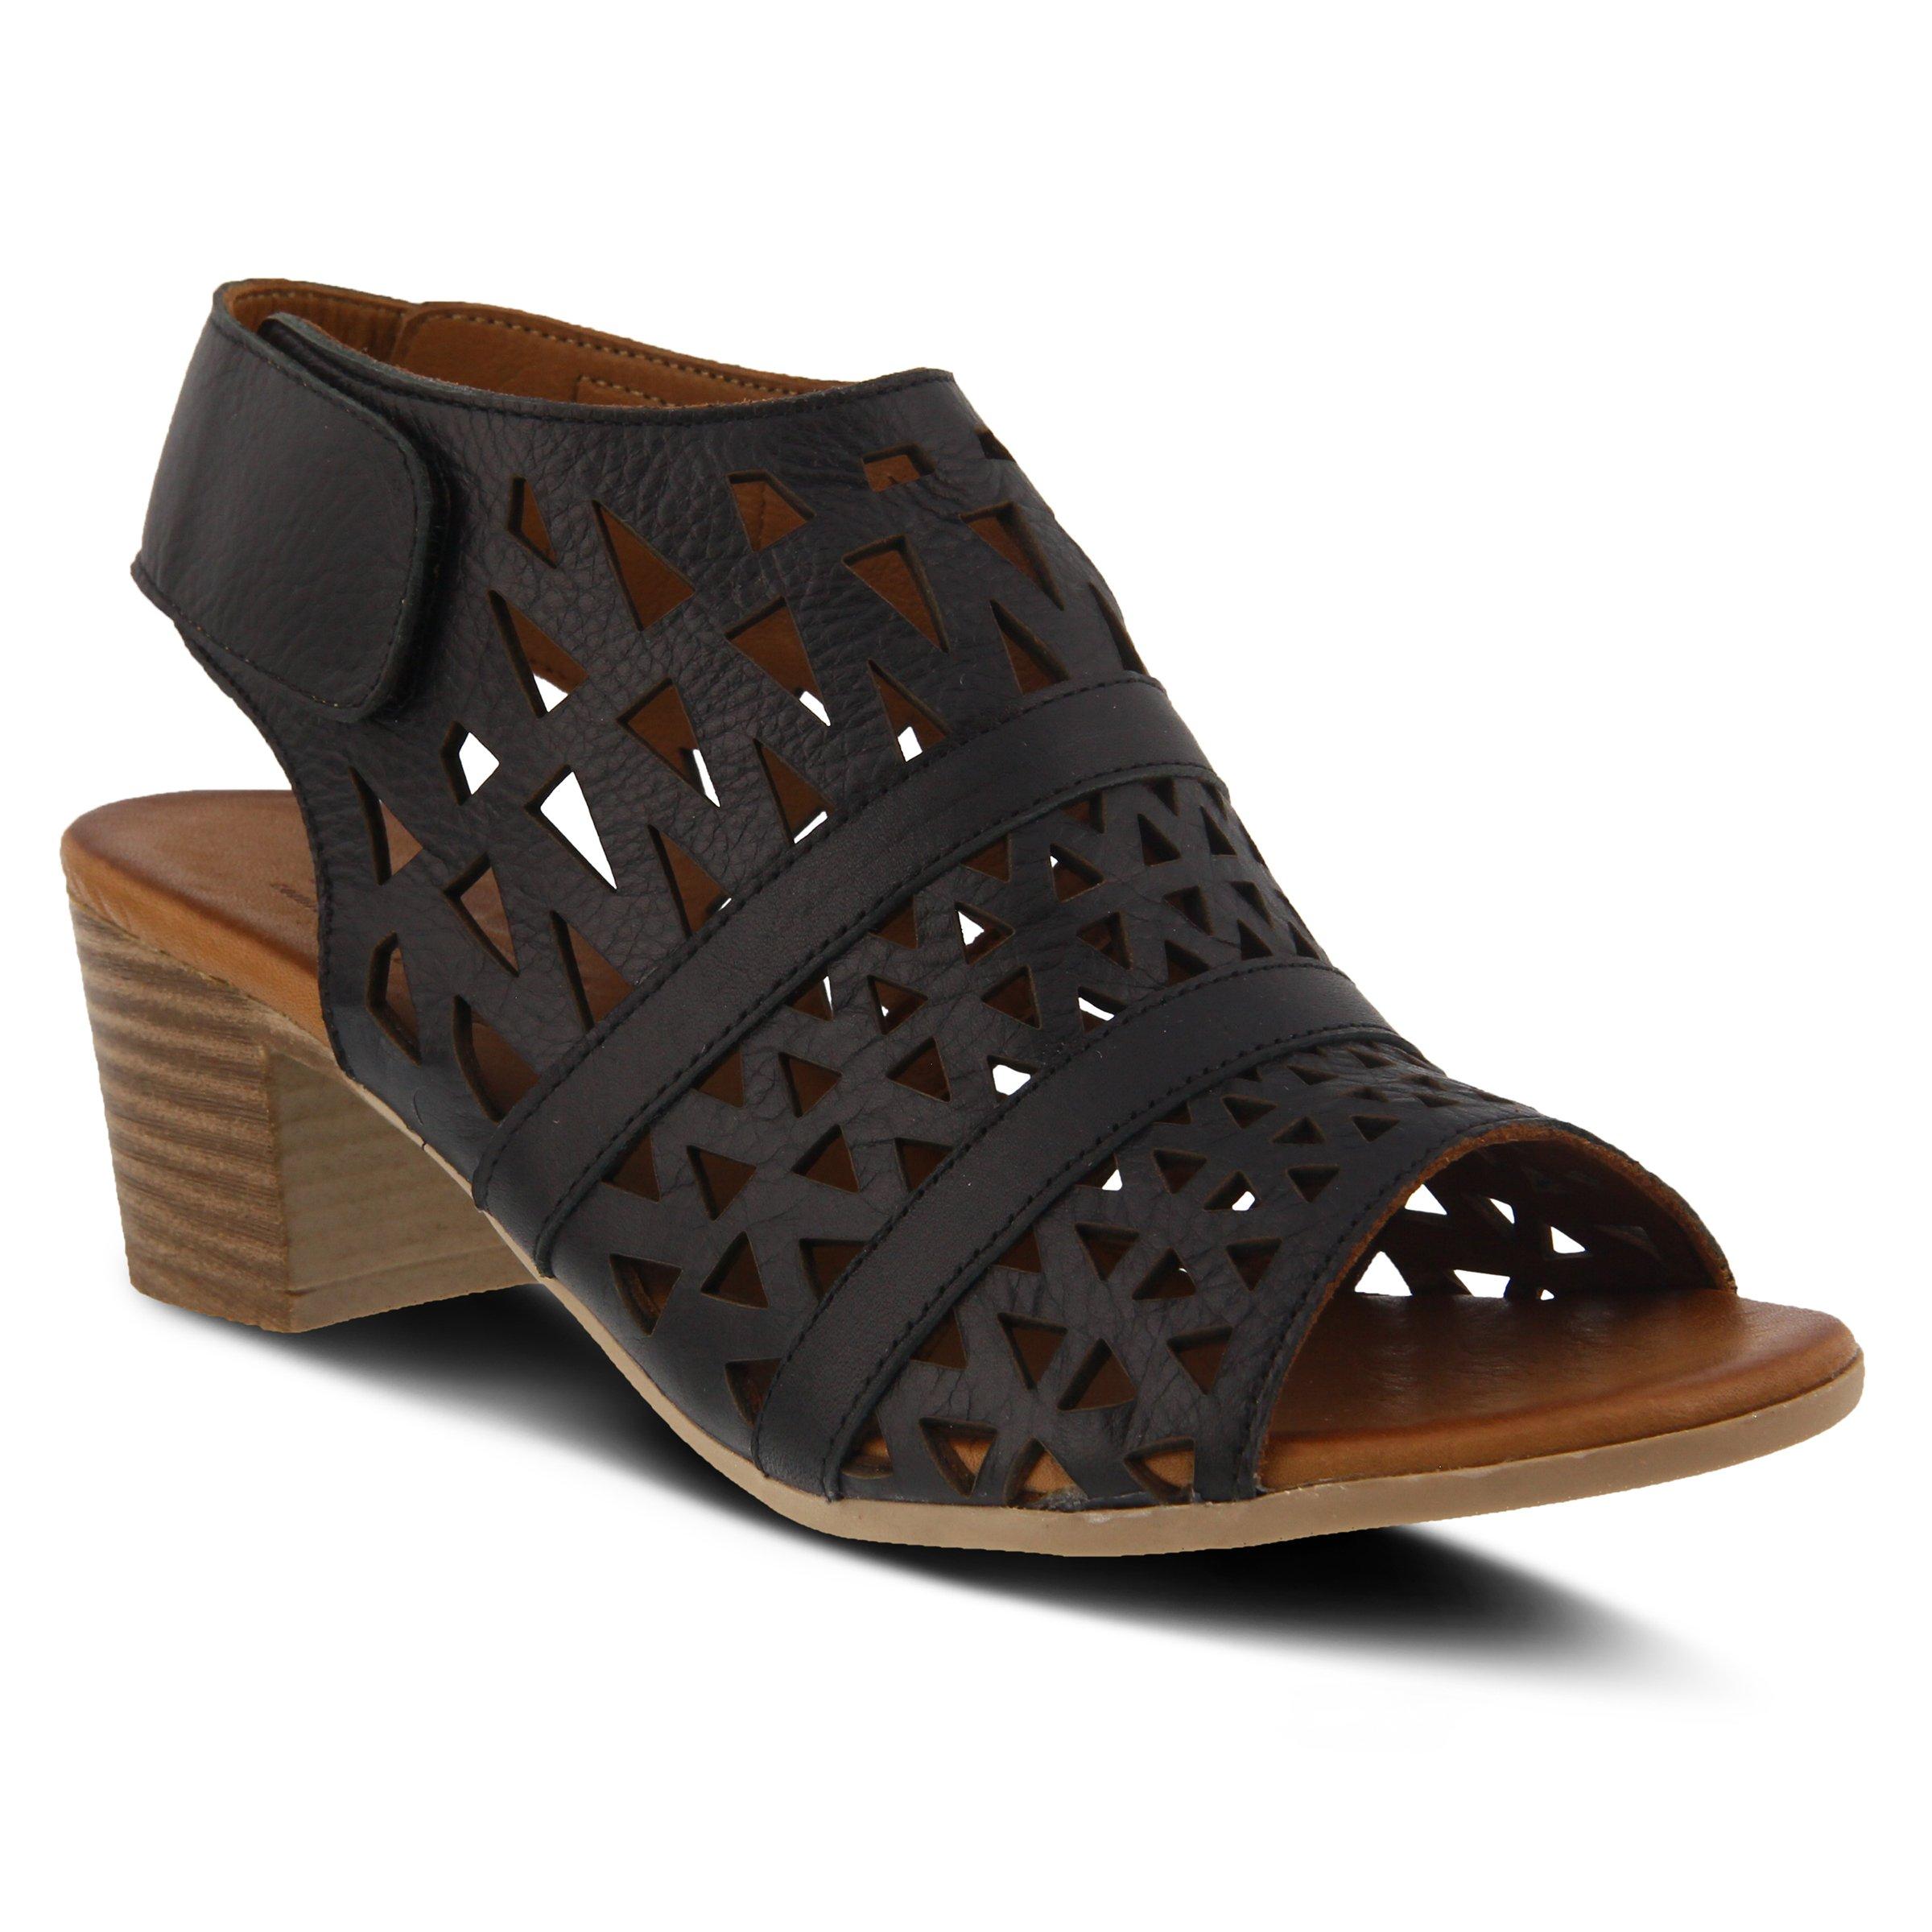 Spring Step Women's Style Dorotha Black EURO Size 41 Leather Sandal